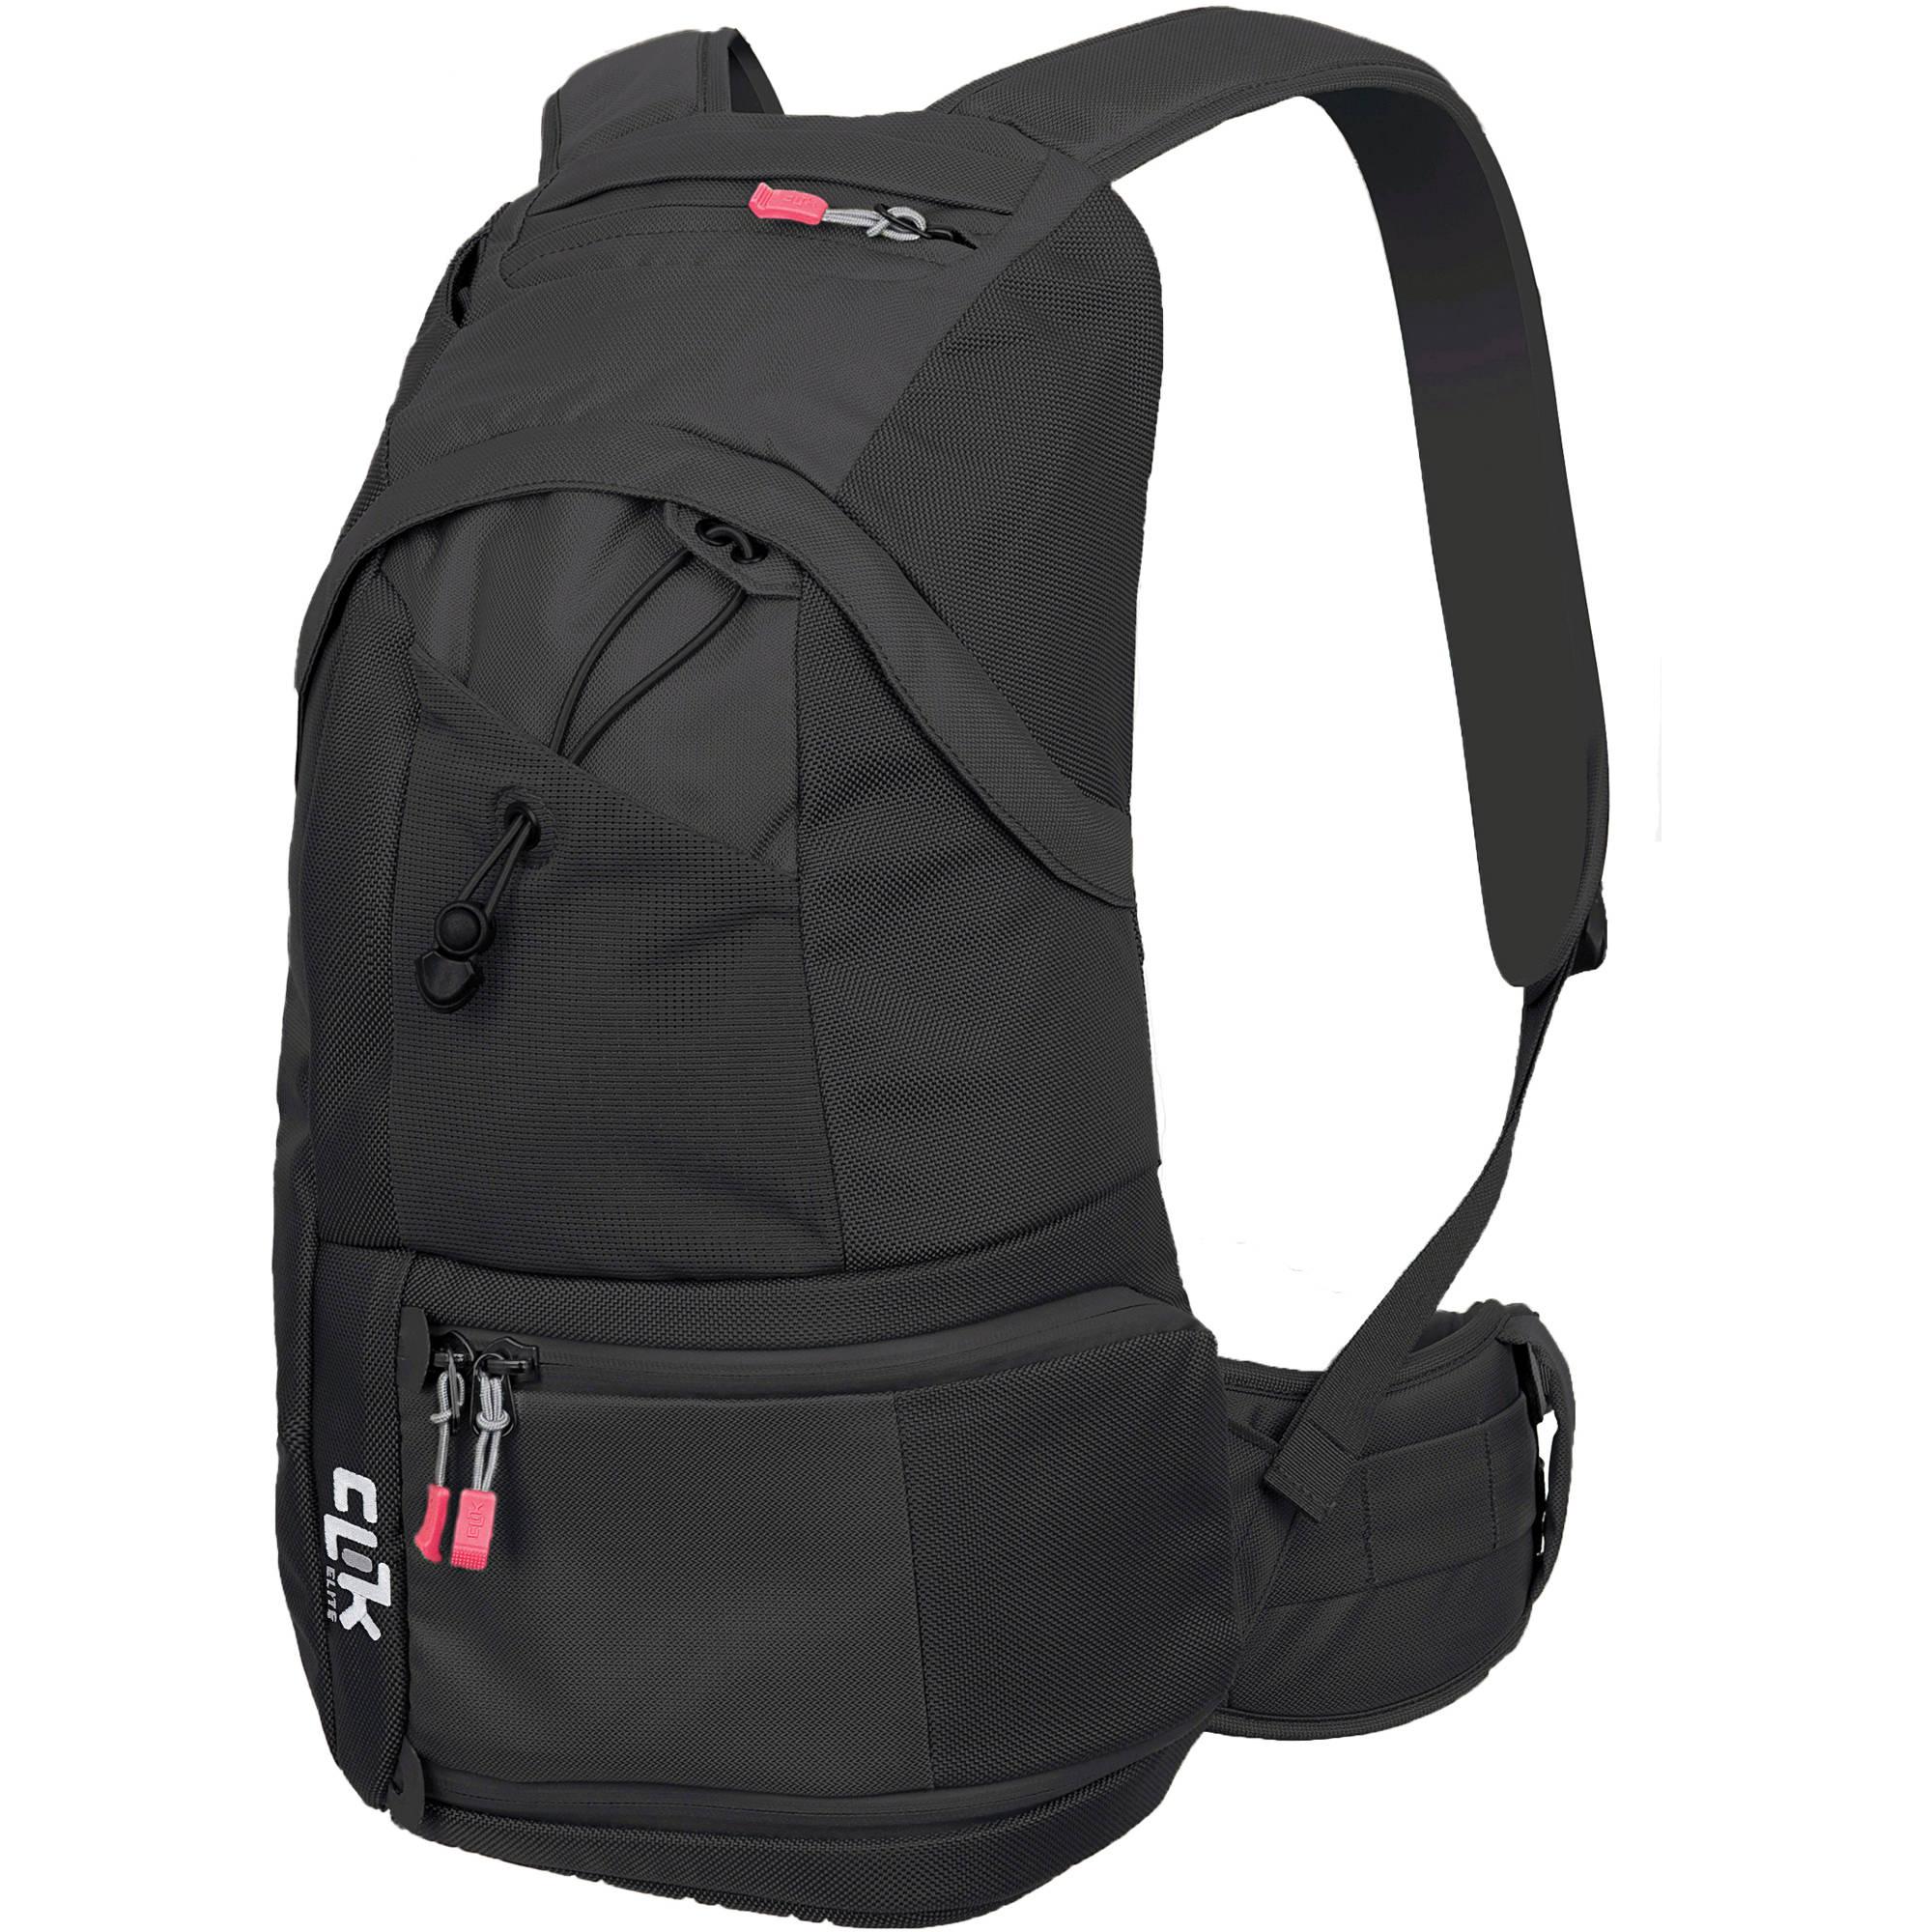 Clik Elite Compact Sport Backpack (Black) CE706BK B&H Photo